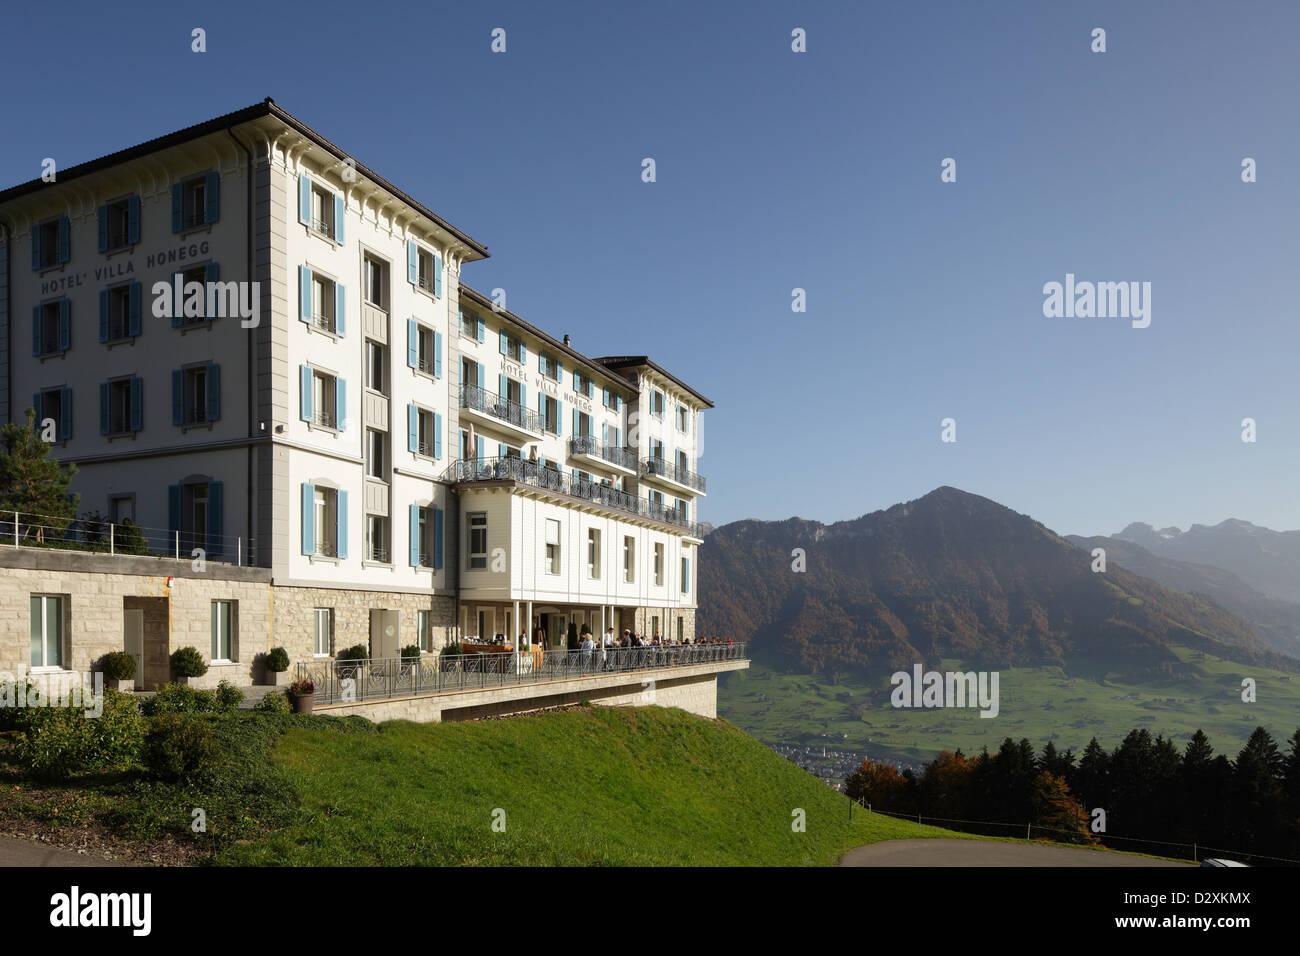 Hotel Villa Honegg dedans lucerne, switzerland, hotel villa honegg in buergenstock near